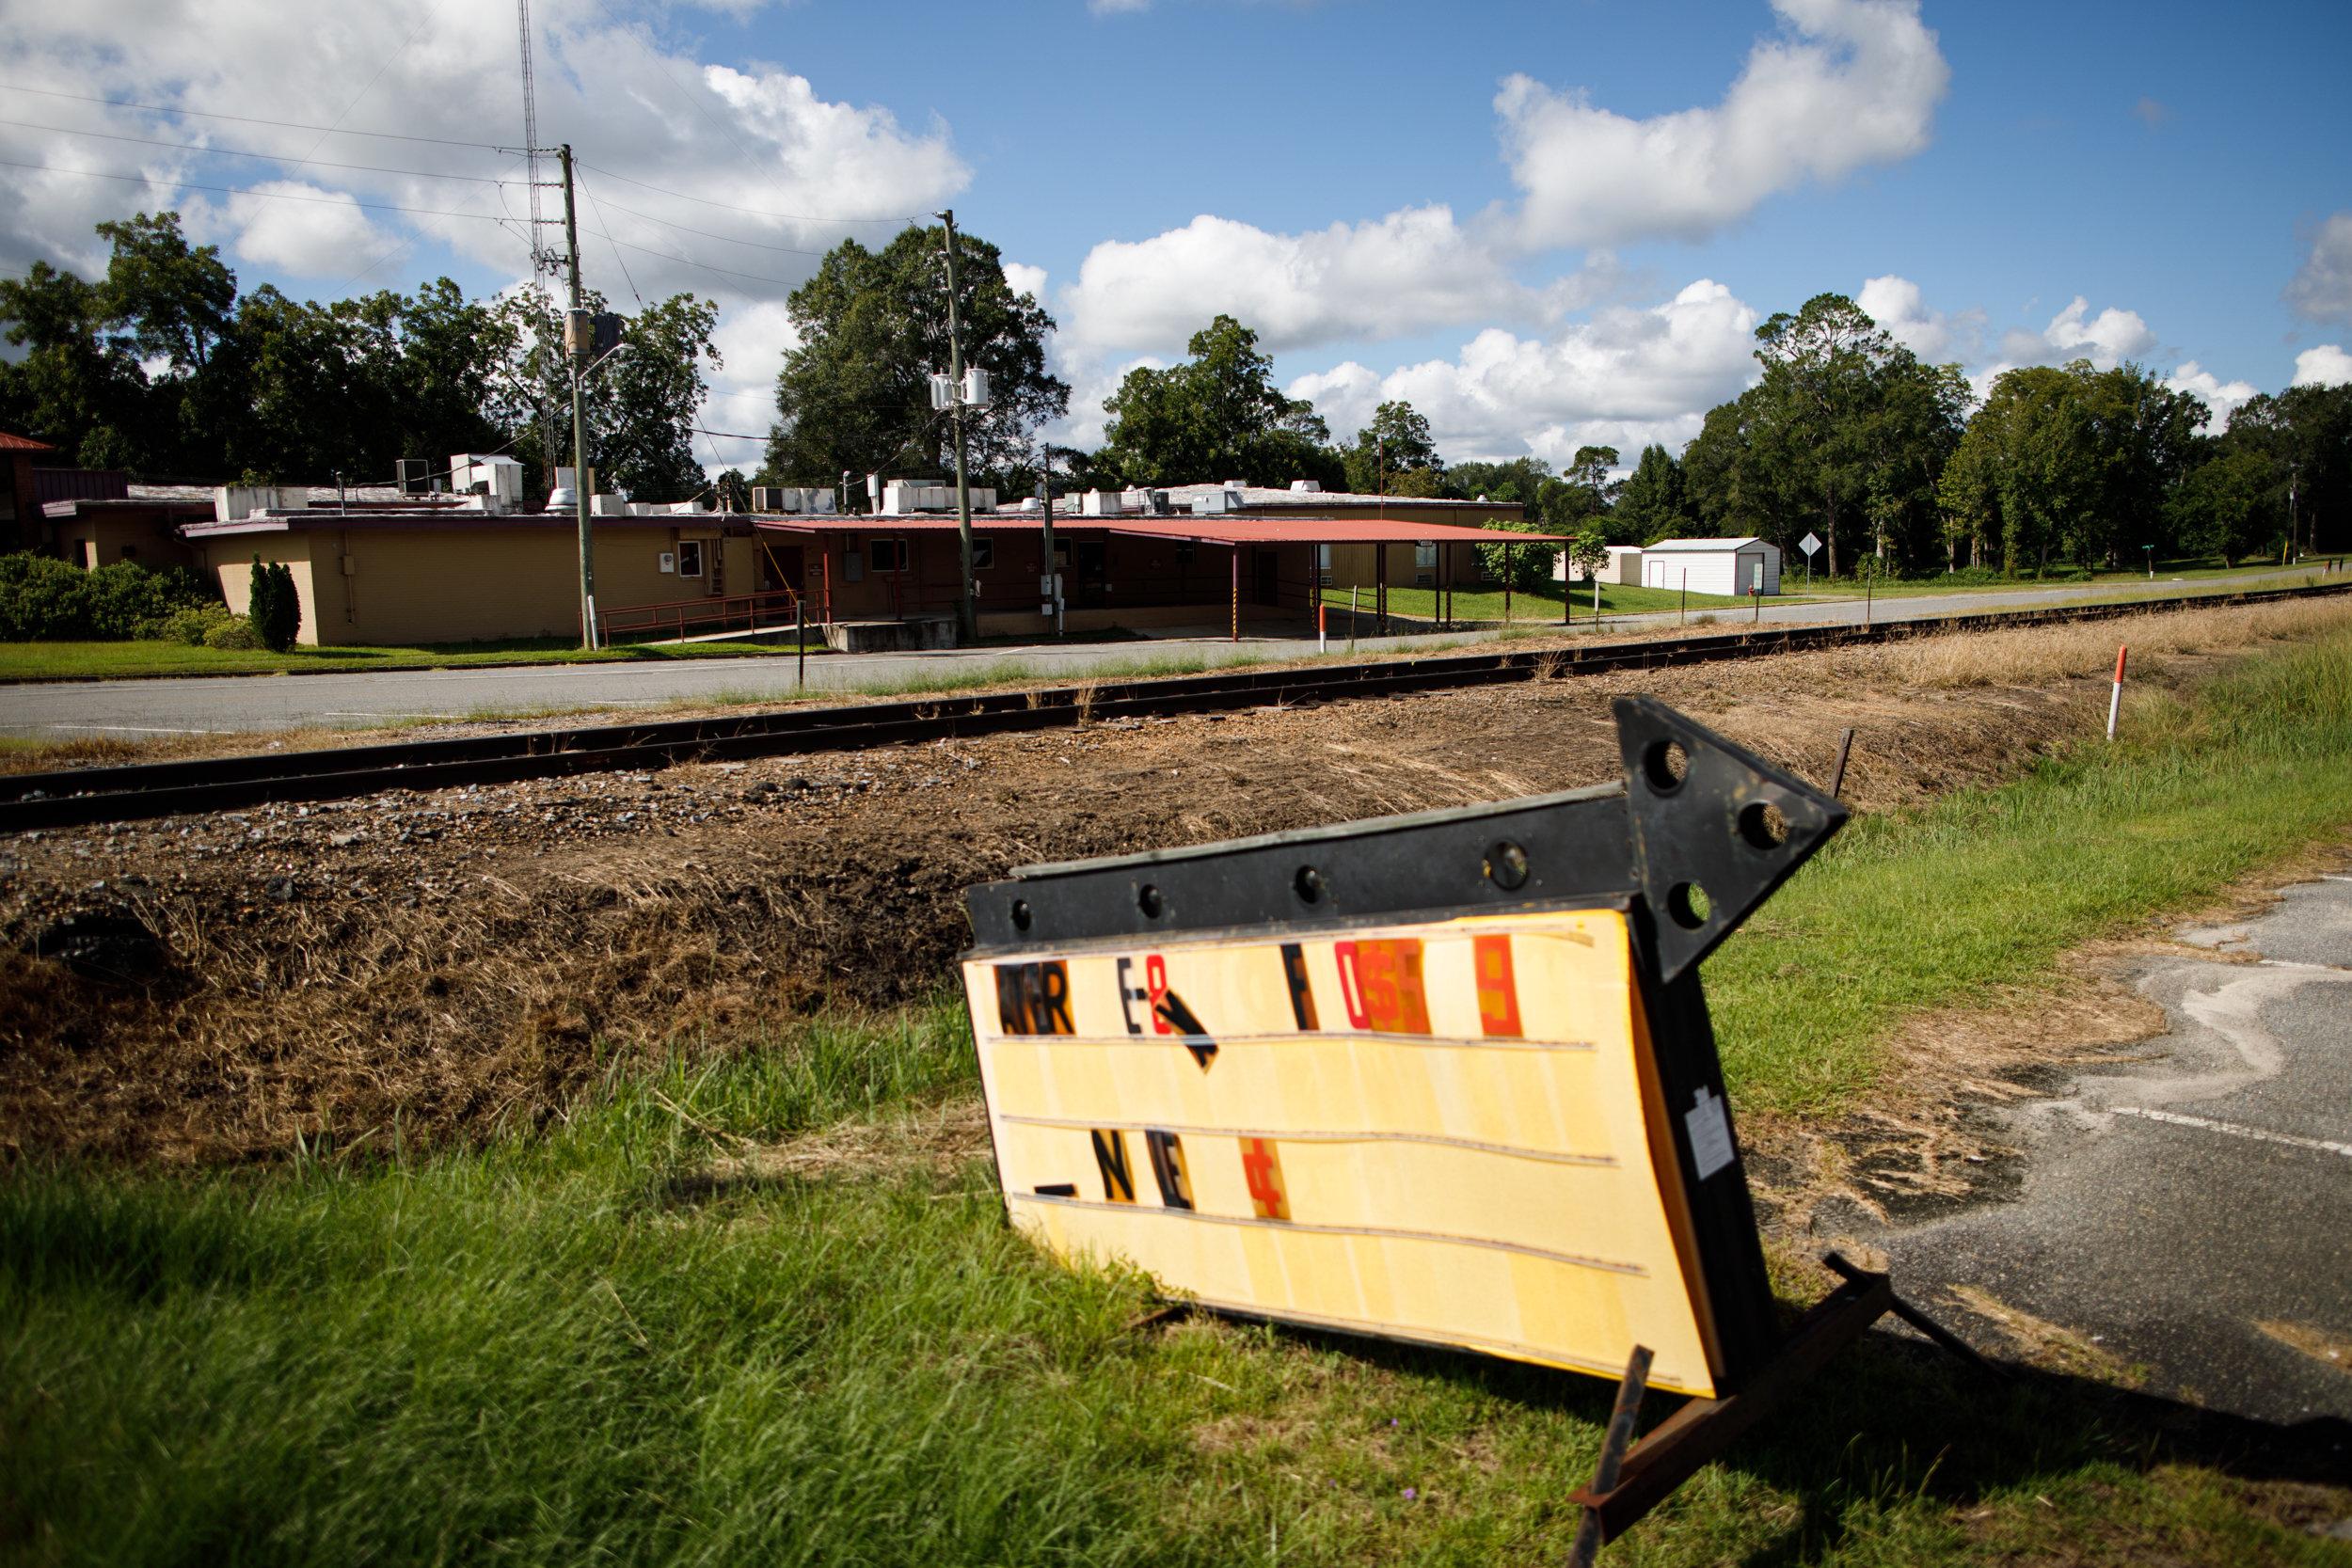 Recently shuttered Lower Oconee Community Hospital seen across train tracks in Glenwood, GA.